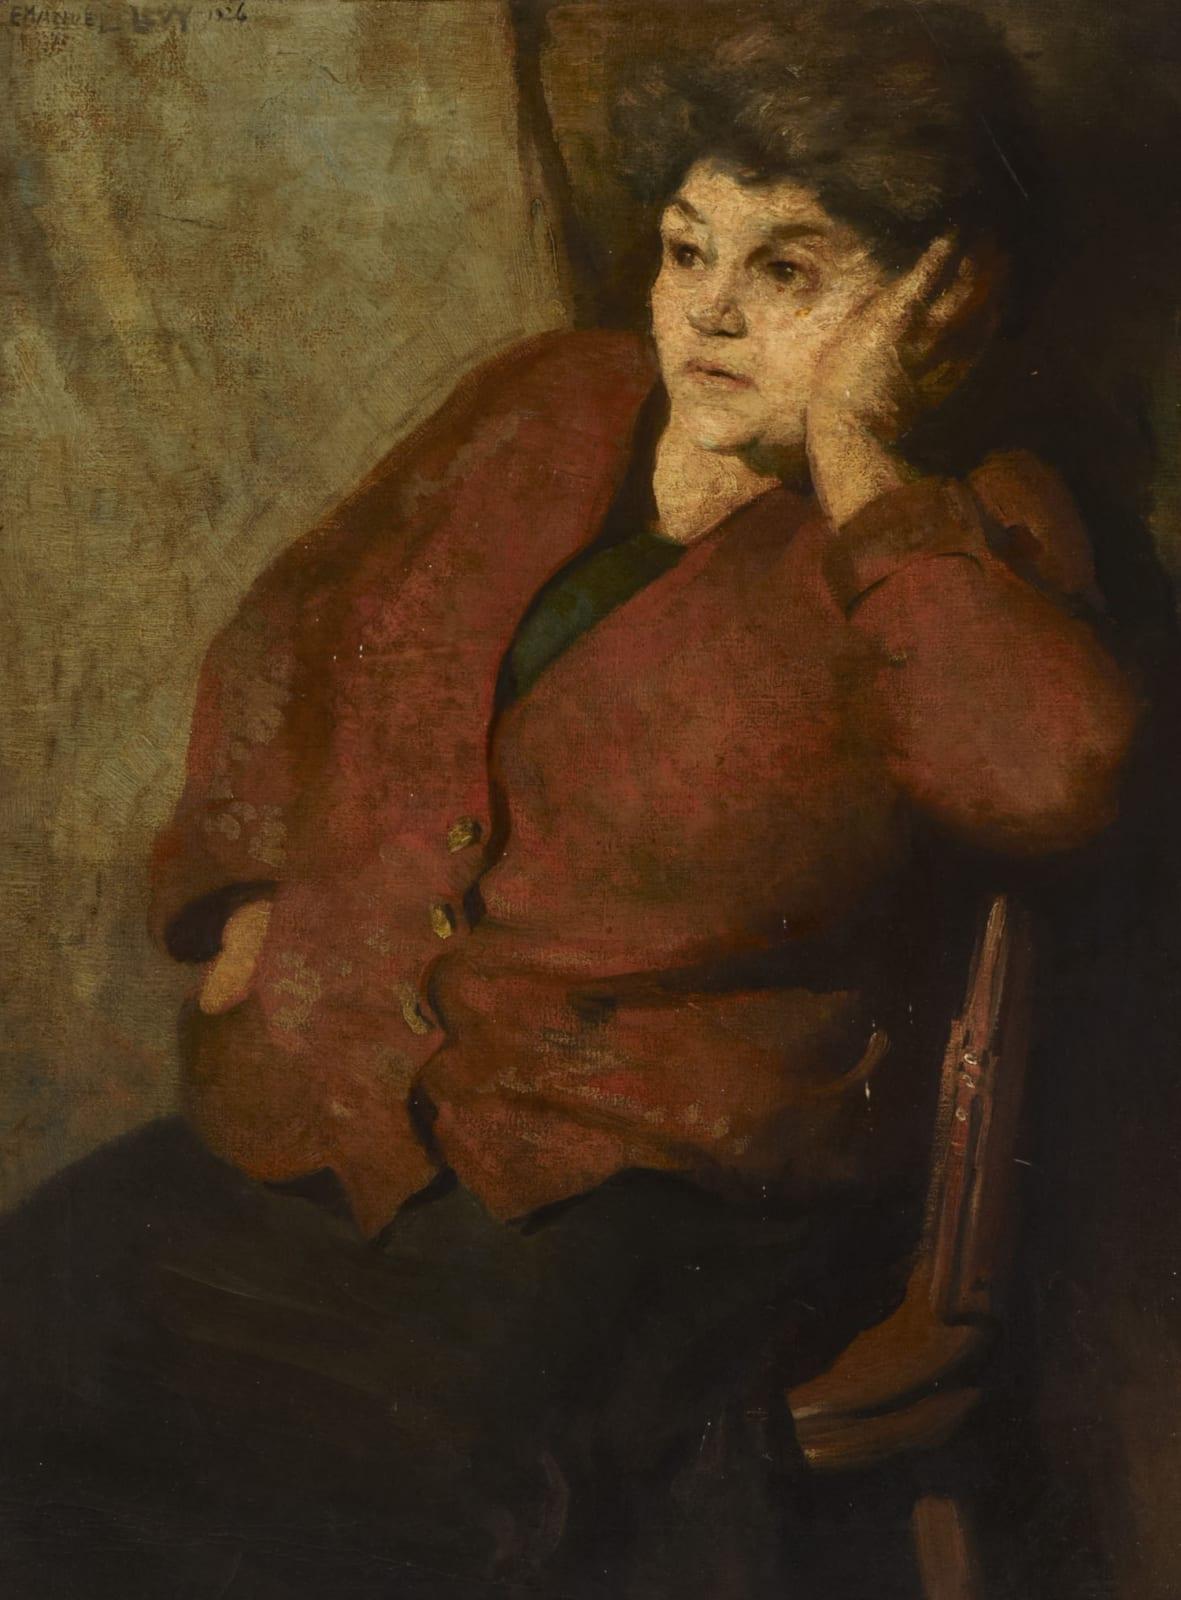 Emmanuel Levy (1900-1986) The Artist's Mother 1926 Oil on canvas 59.5 x 44.5 cm Ben Uri Collection © Emmanuel Levy estate